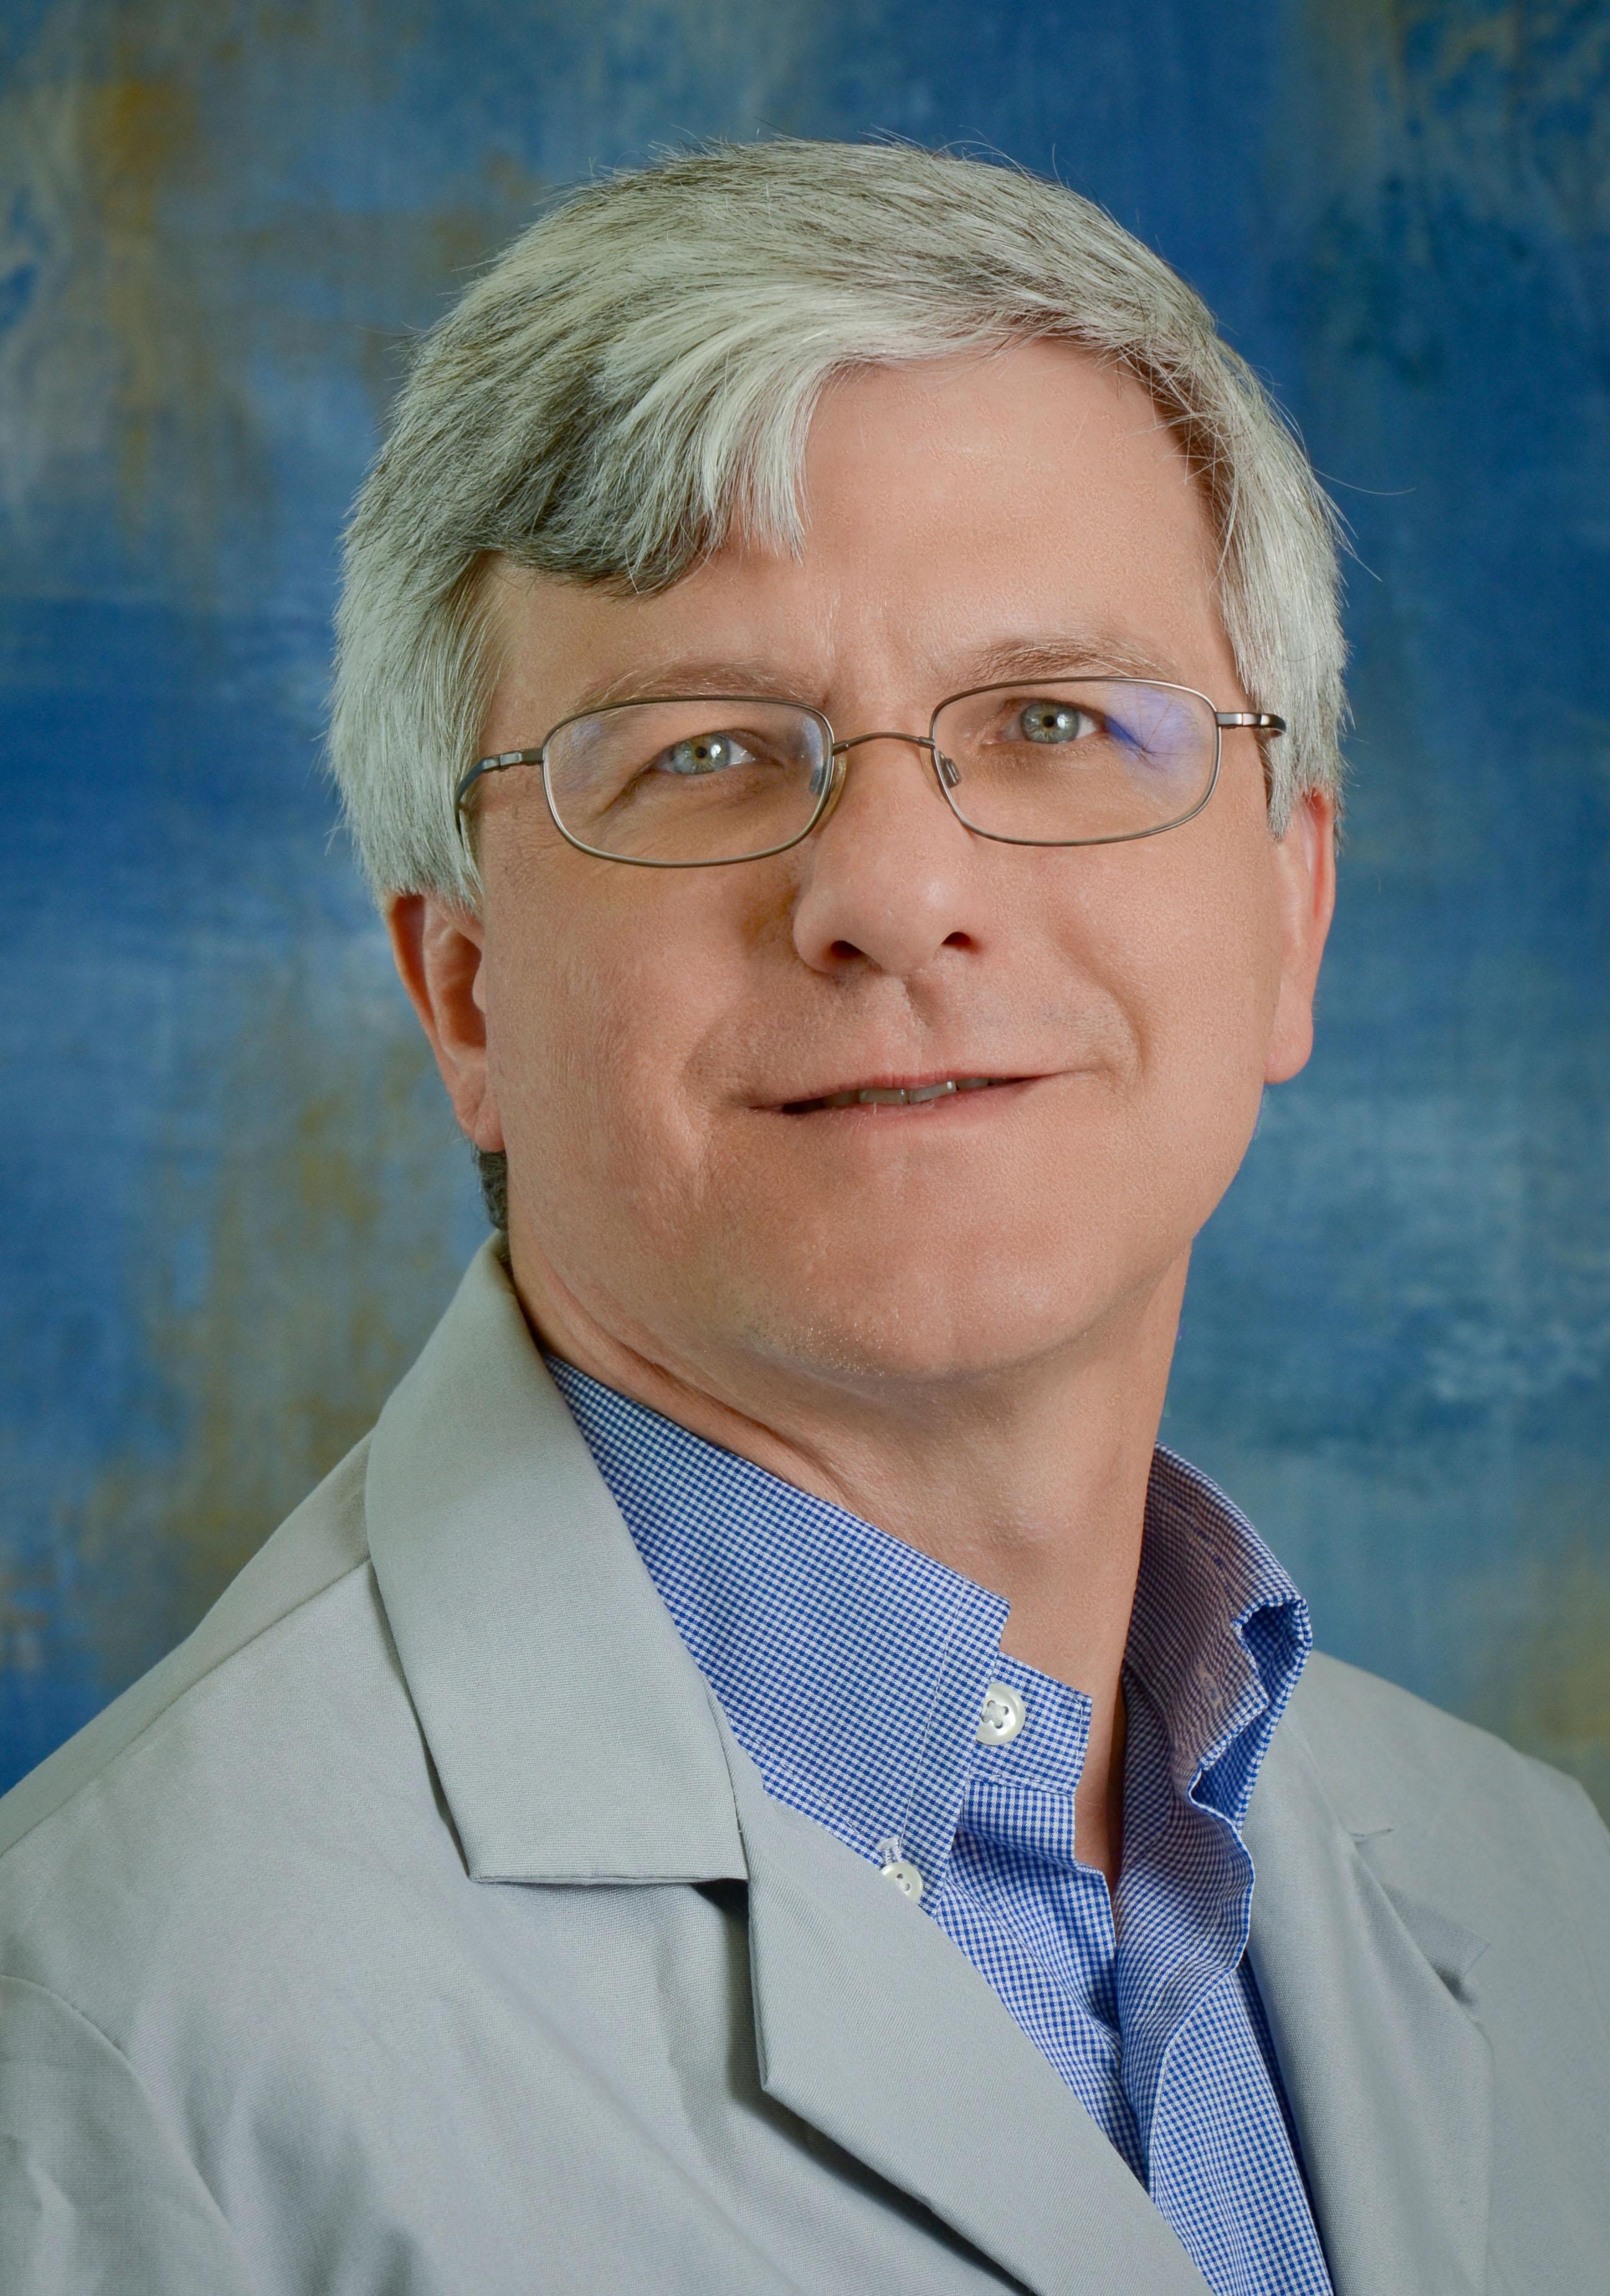 Manuel F. Utset, MD